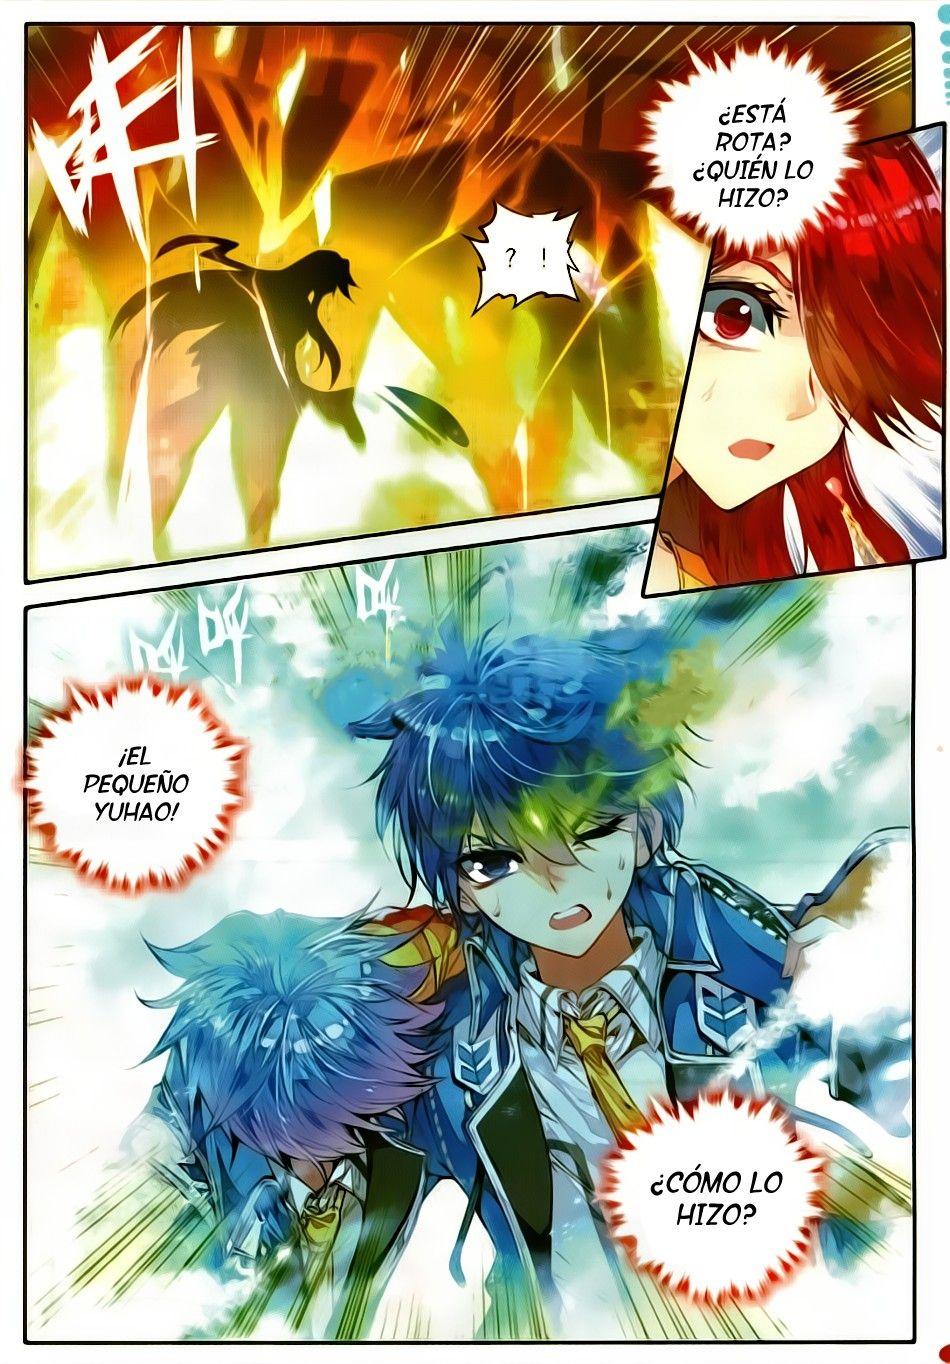 http://c5.ninemanga.com/es_manga/pic2/33/16417/511293/a1e89701ae990c30a96315f9e4212936.jpg Page 16